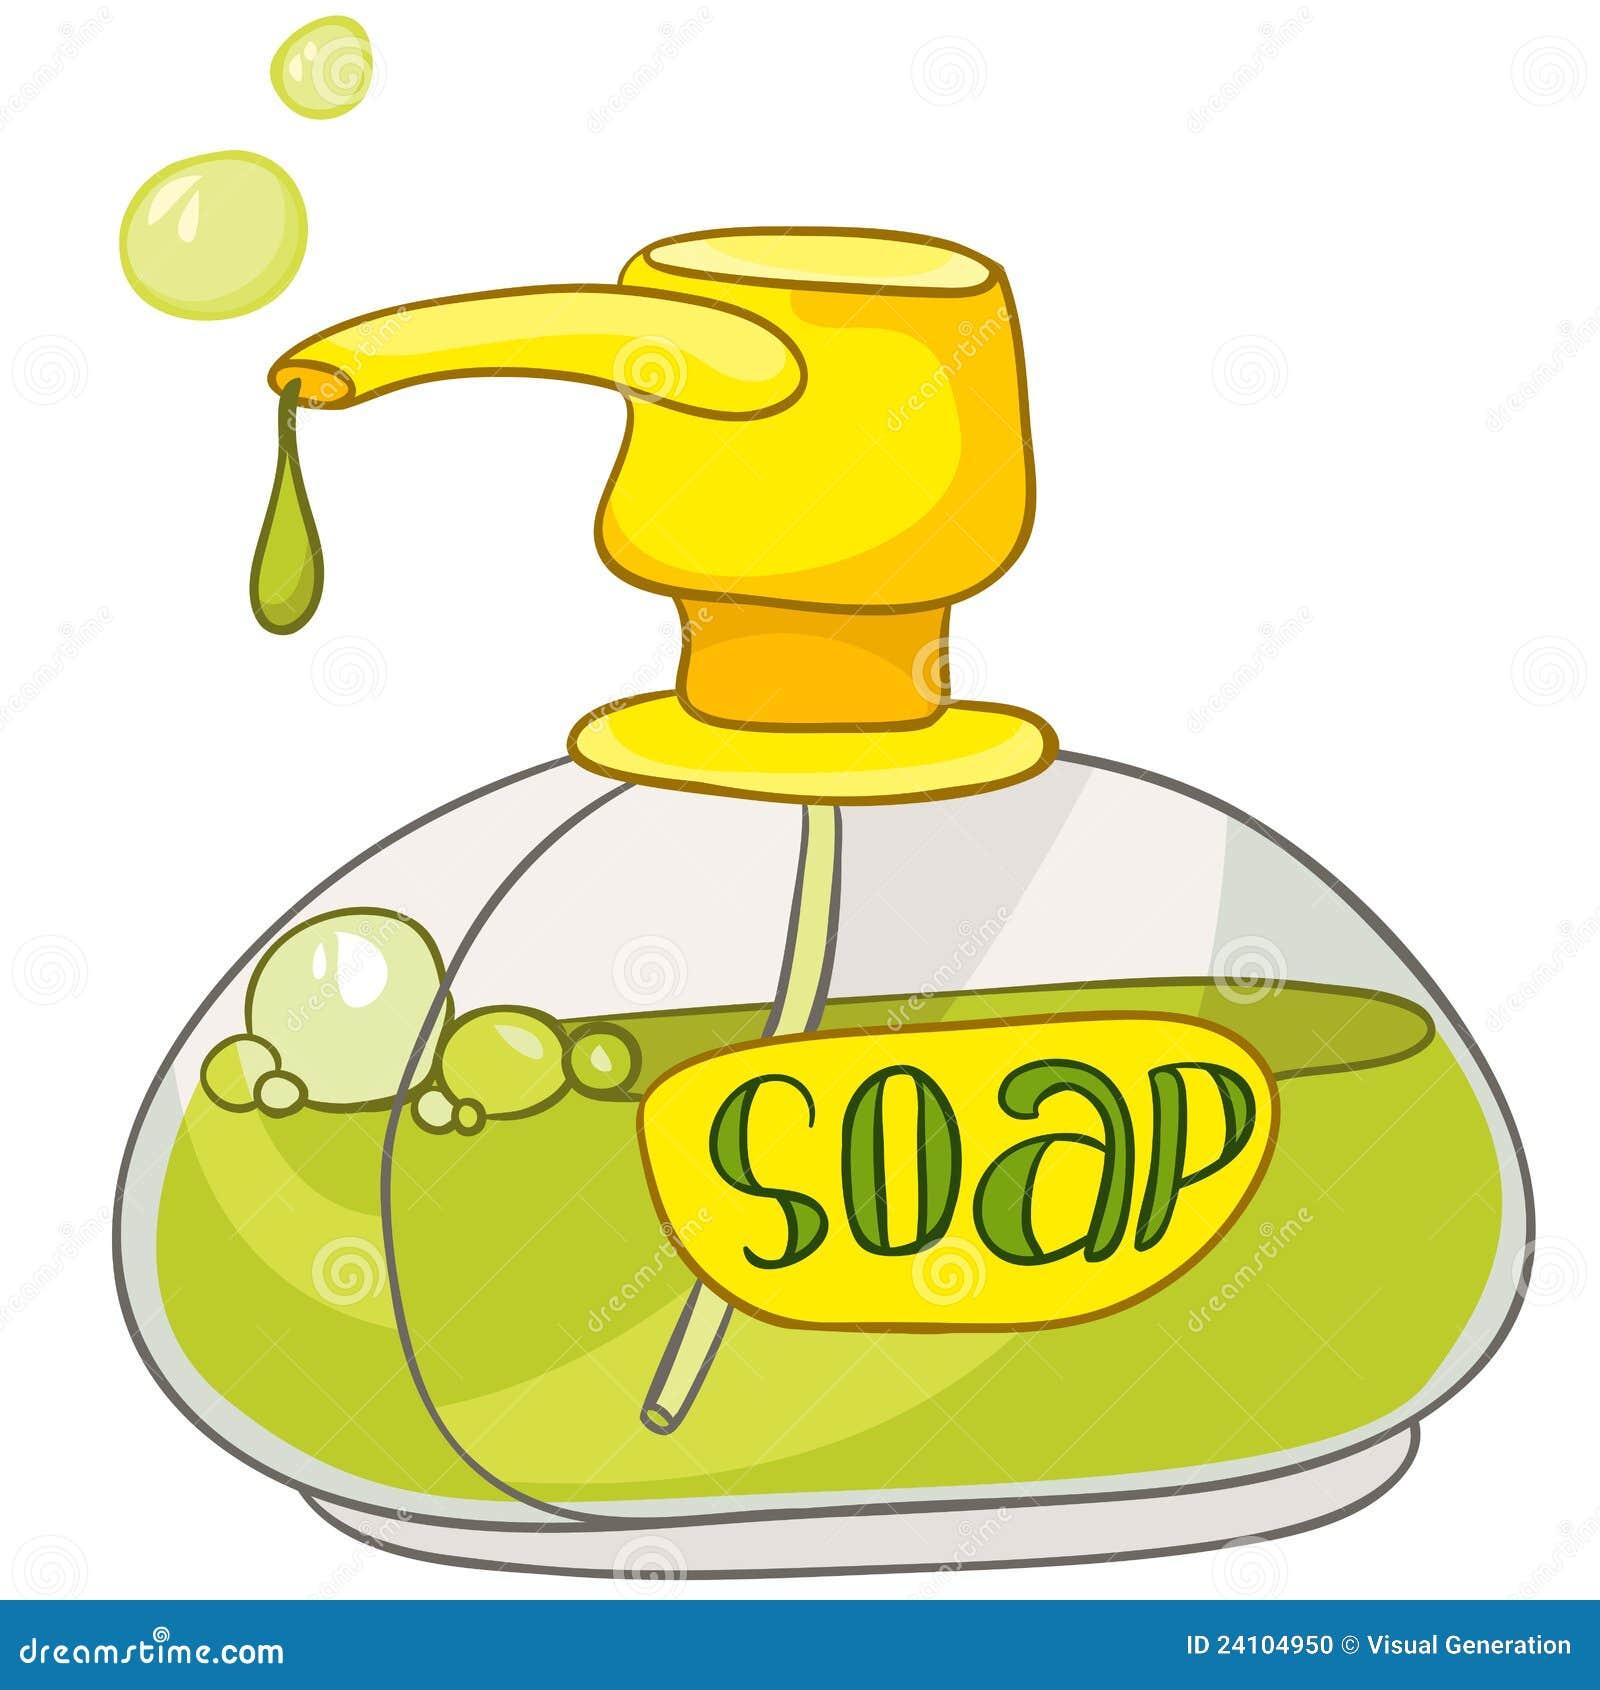 cartoon home washroom soap stock vector illustration of liquid 24104950. Black Bedroom Furniture Sets. Home Design Ideas